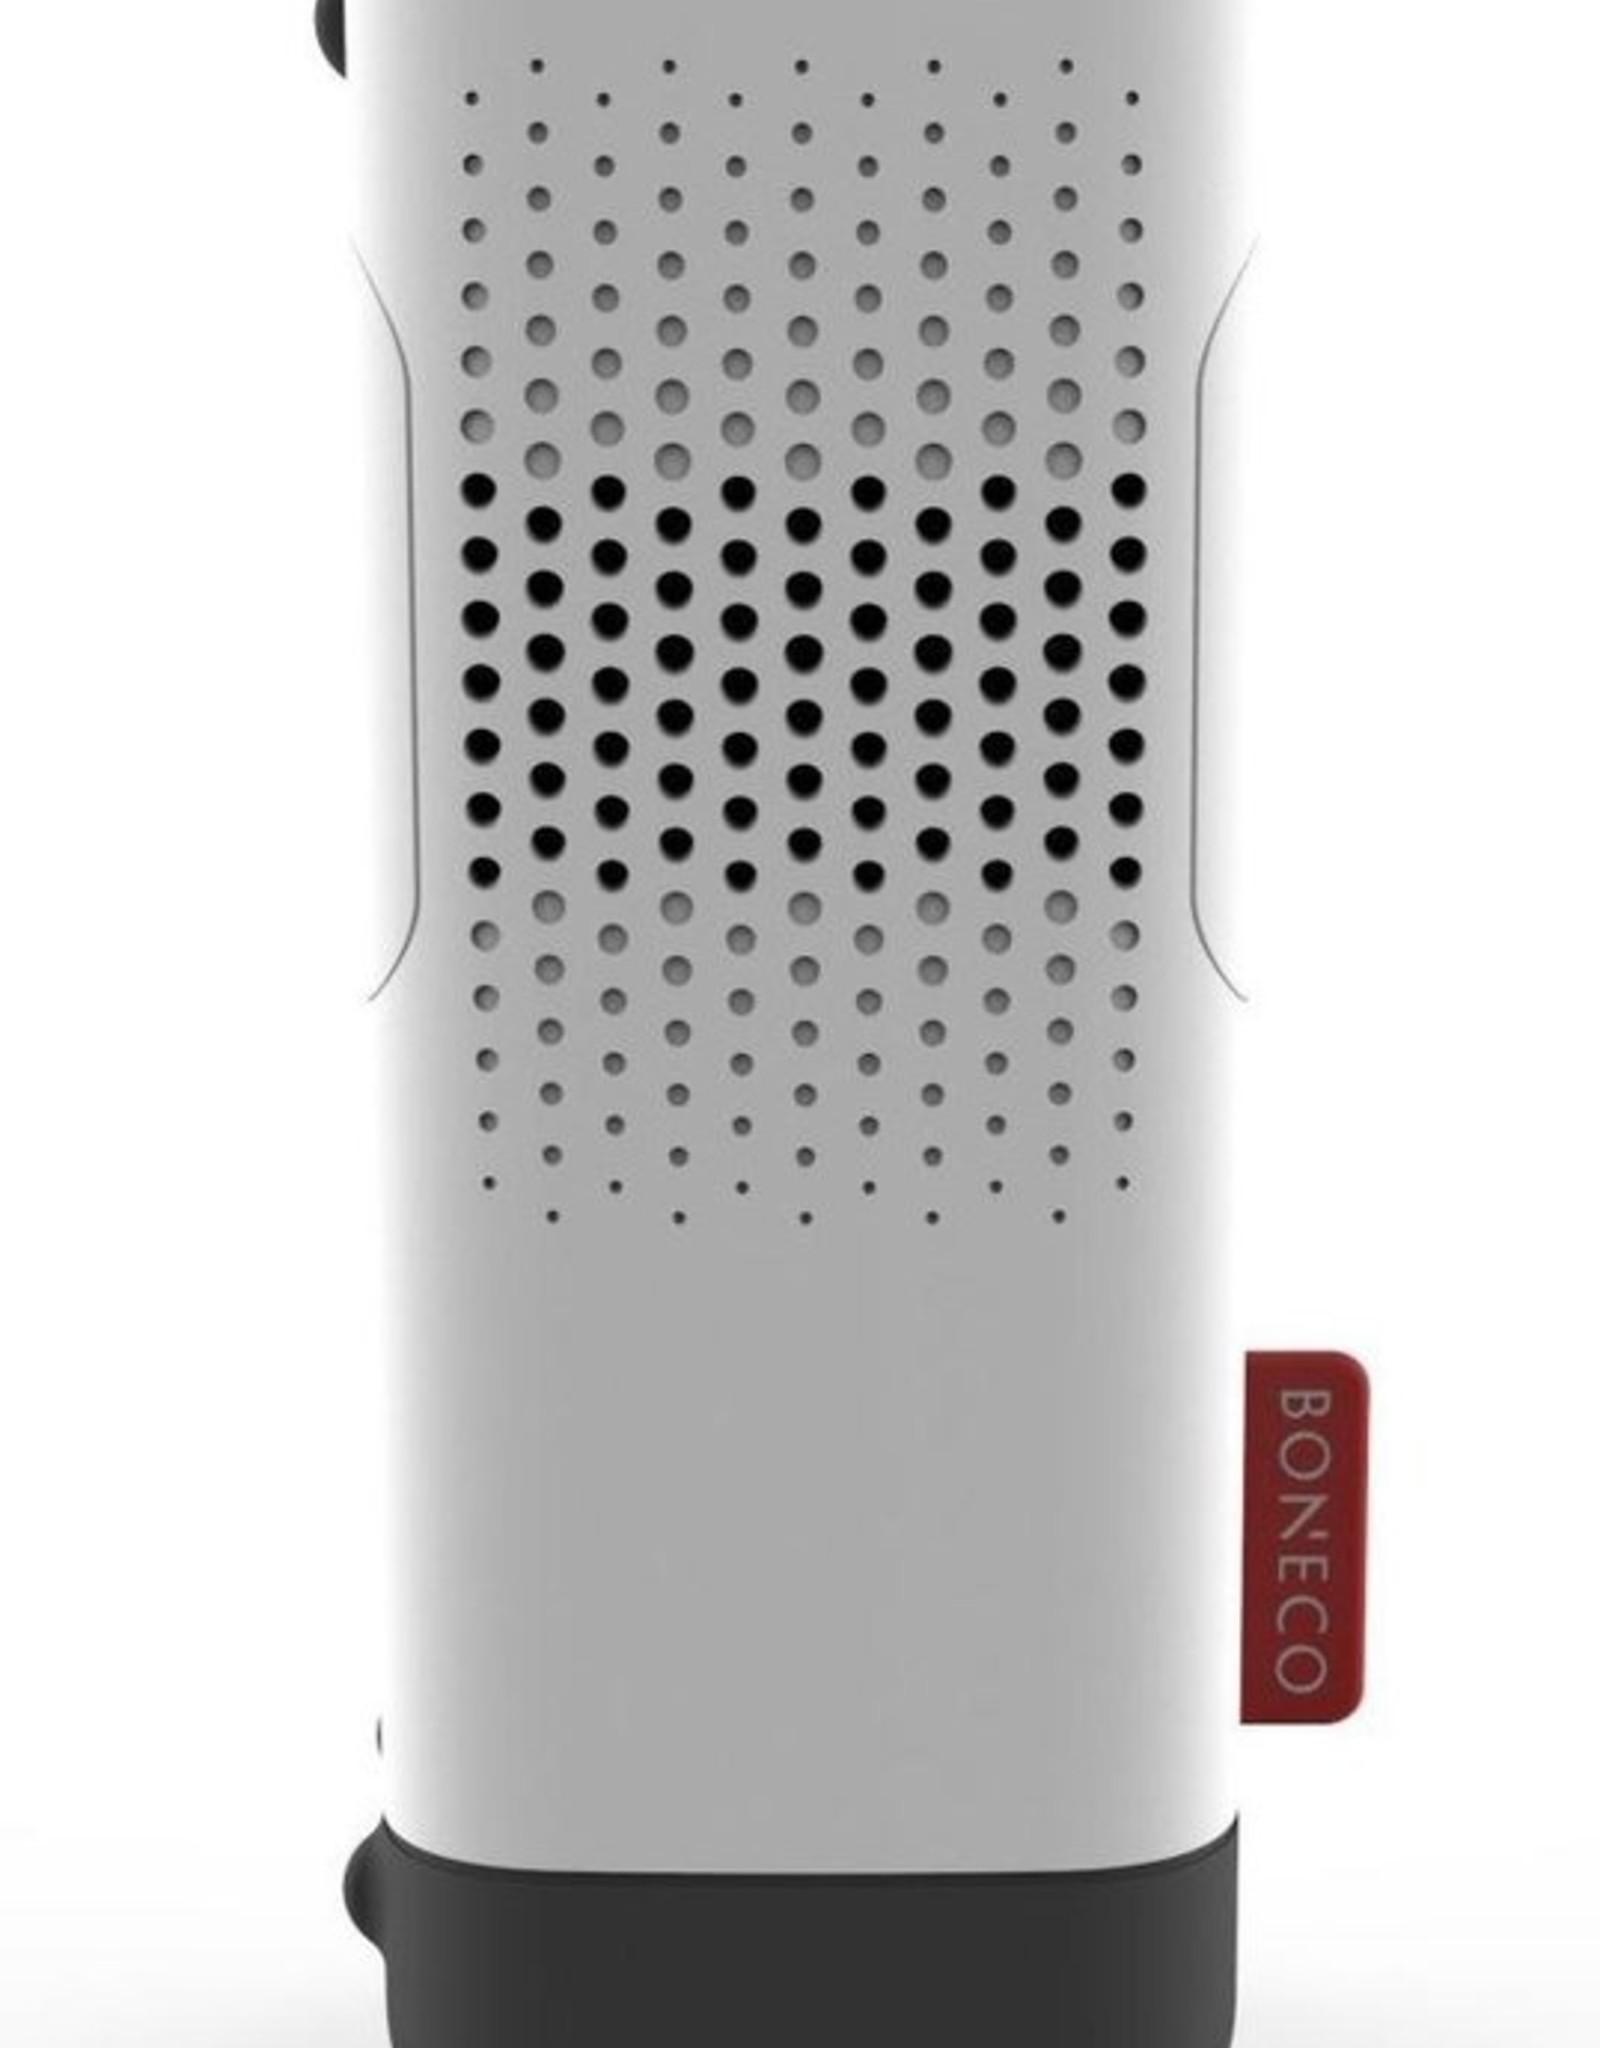 Boneco Boneco P50 air purifier